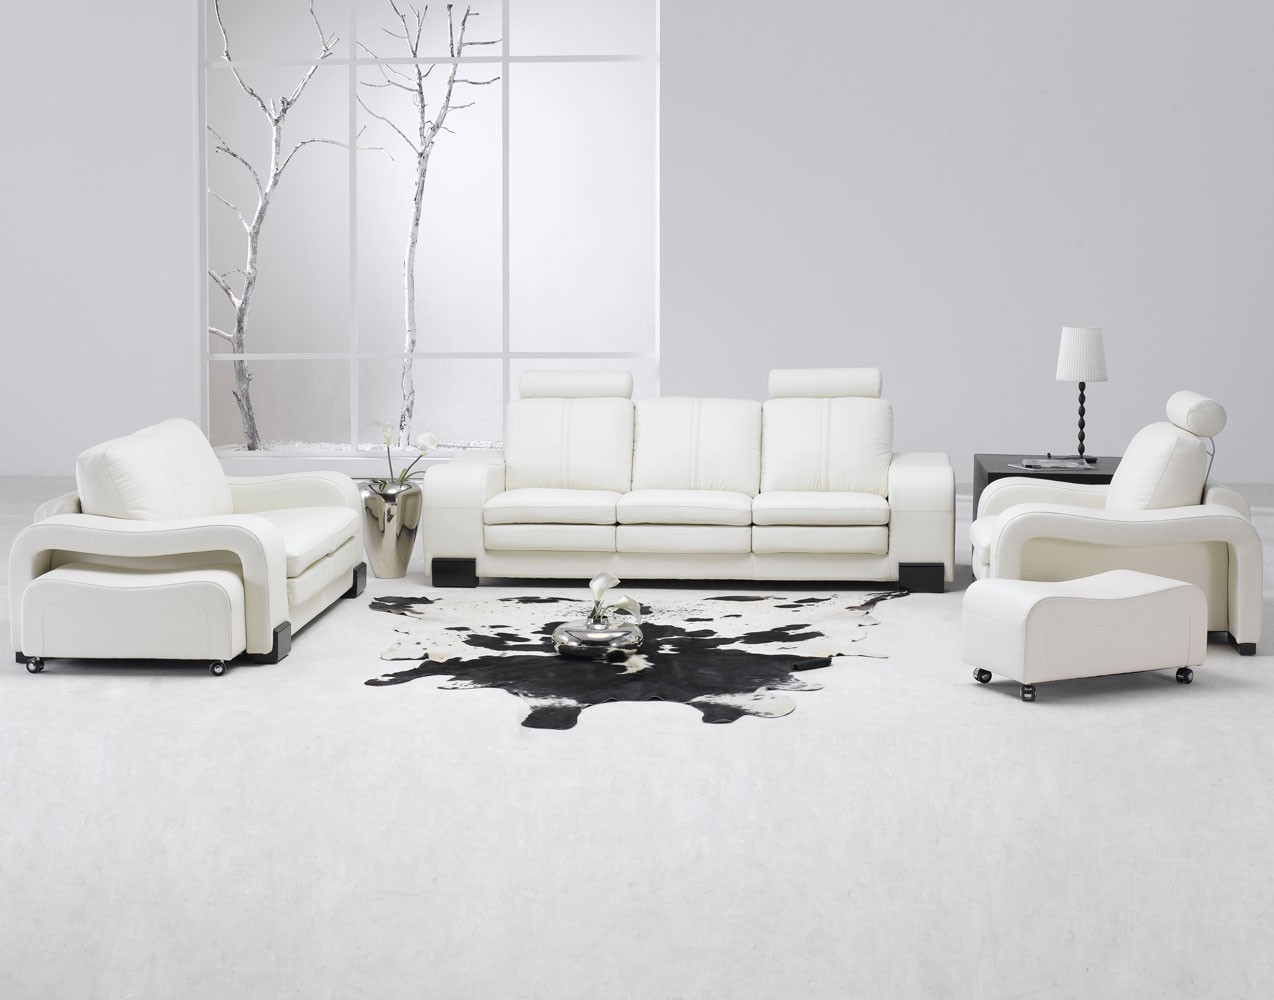 http://1.bp.blogspot.com/-KXkPJsiECVU/T0JppVLJU6I/AAAAAAAAAEY/n7qbrLzK-TE/s1600/Modern-minimalist-living-room-interior-design.jpg